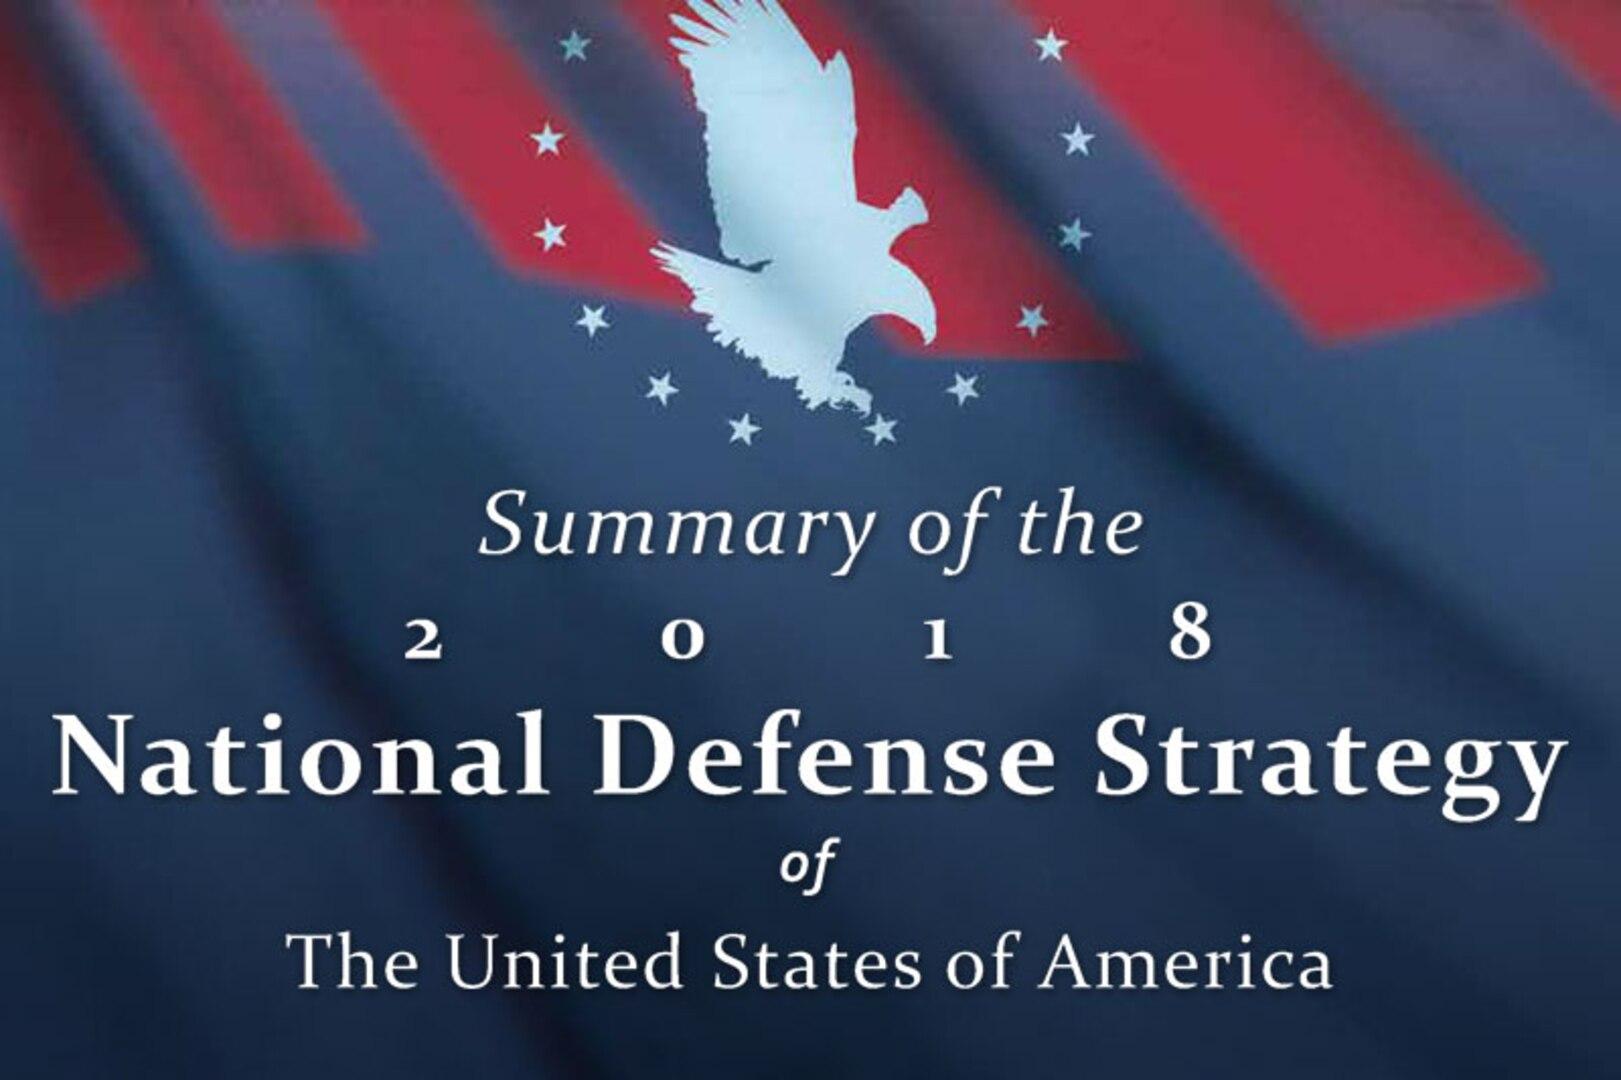 Defense Secretary James N. Mattis announced the new National Defense Strategy in a speech at the Johns Hopkins School of Advanced International Studies in Washington, Jan. 19, 2018.